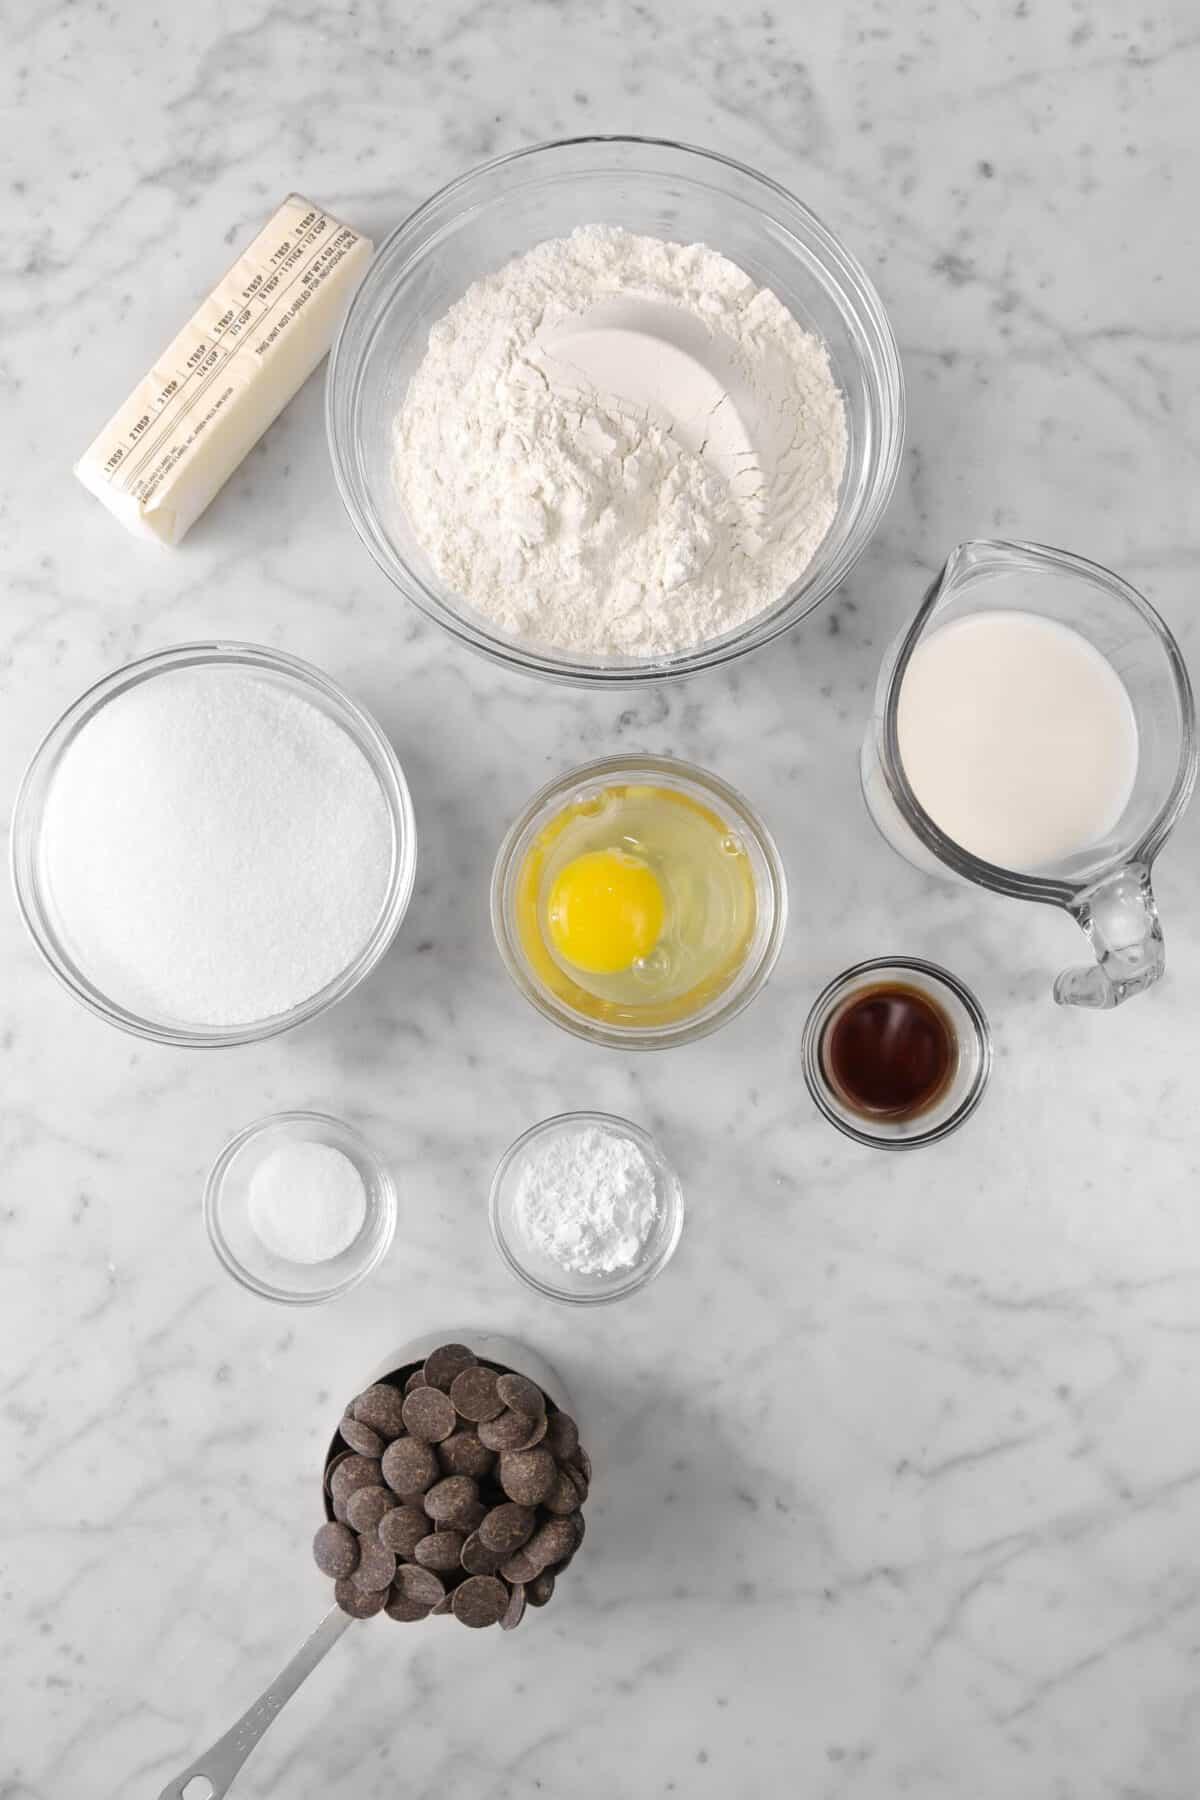 flour, butter, sugar, egg, milk, vanilla, baking powder, salt, and chocolate chips on a marble counter